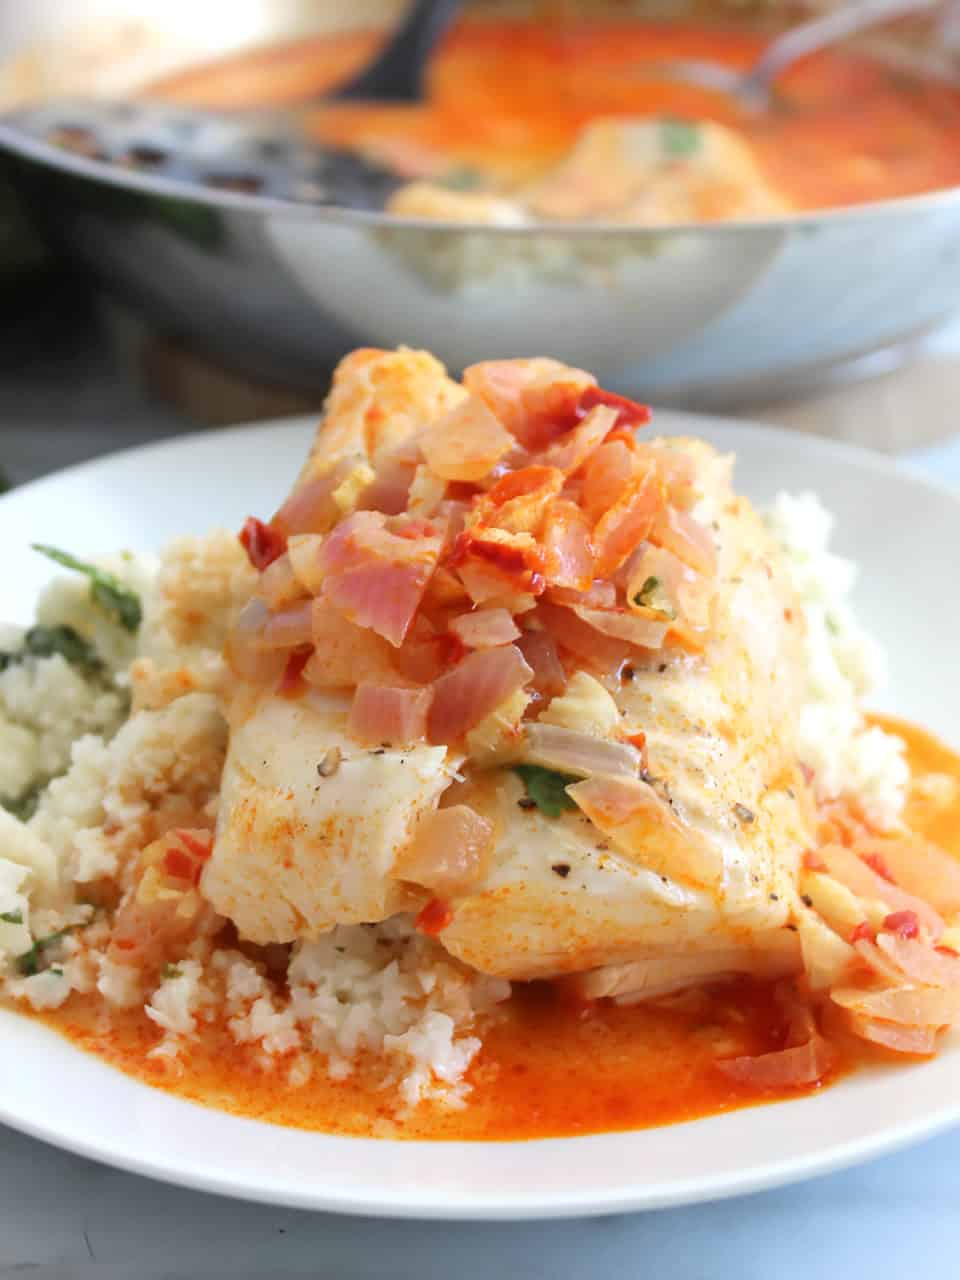 Fish served with cauliflower rice